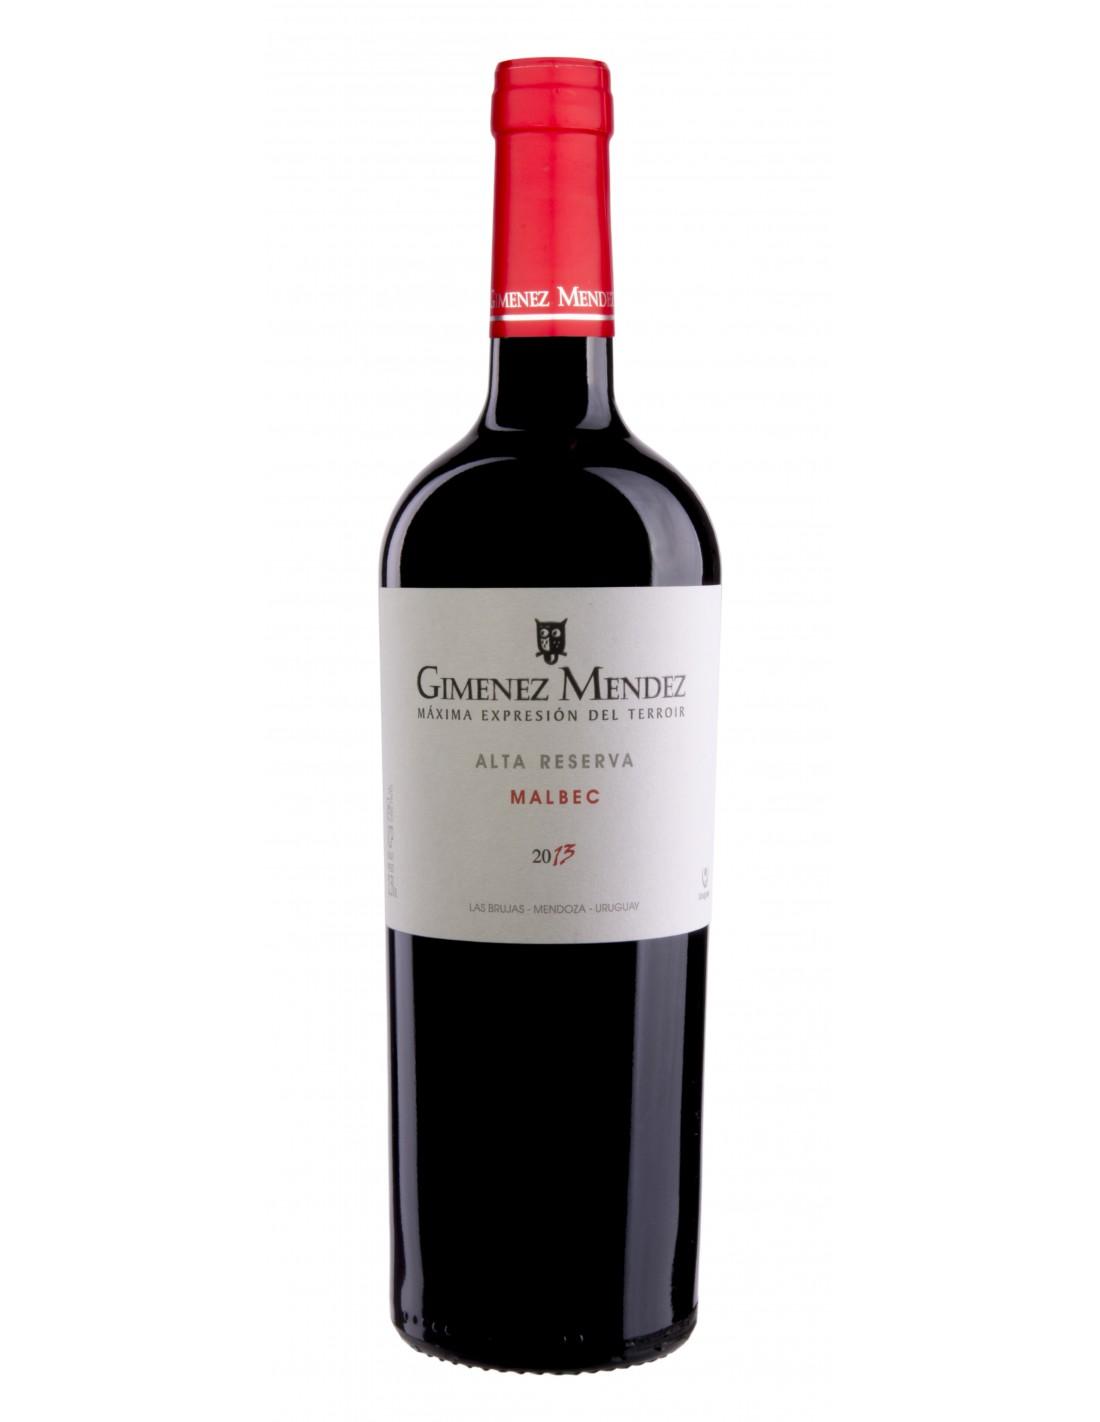 Vin rosu, Malbec, Gimenez Mendez Alta Reserva, 0.75L, 14% alc., Uruguay